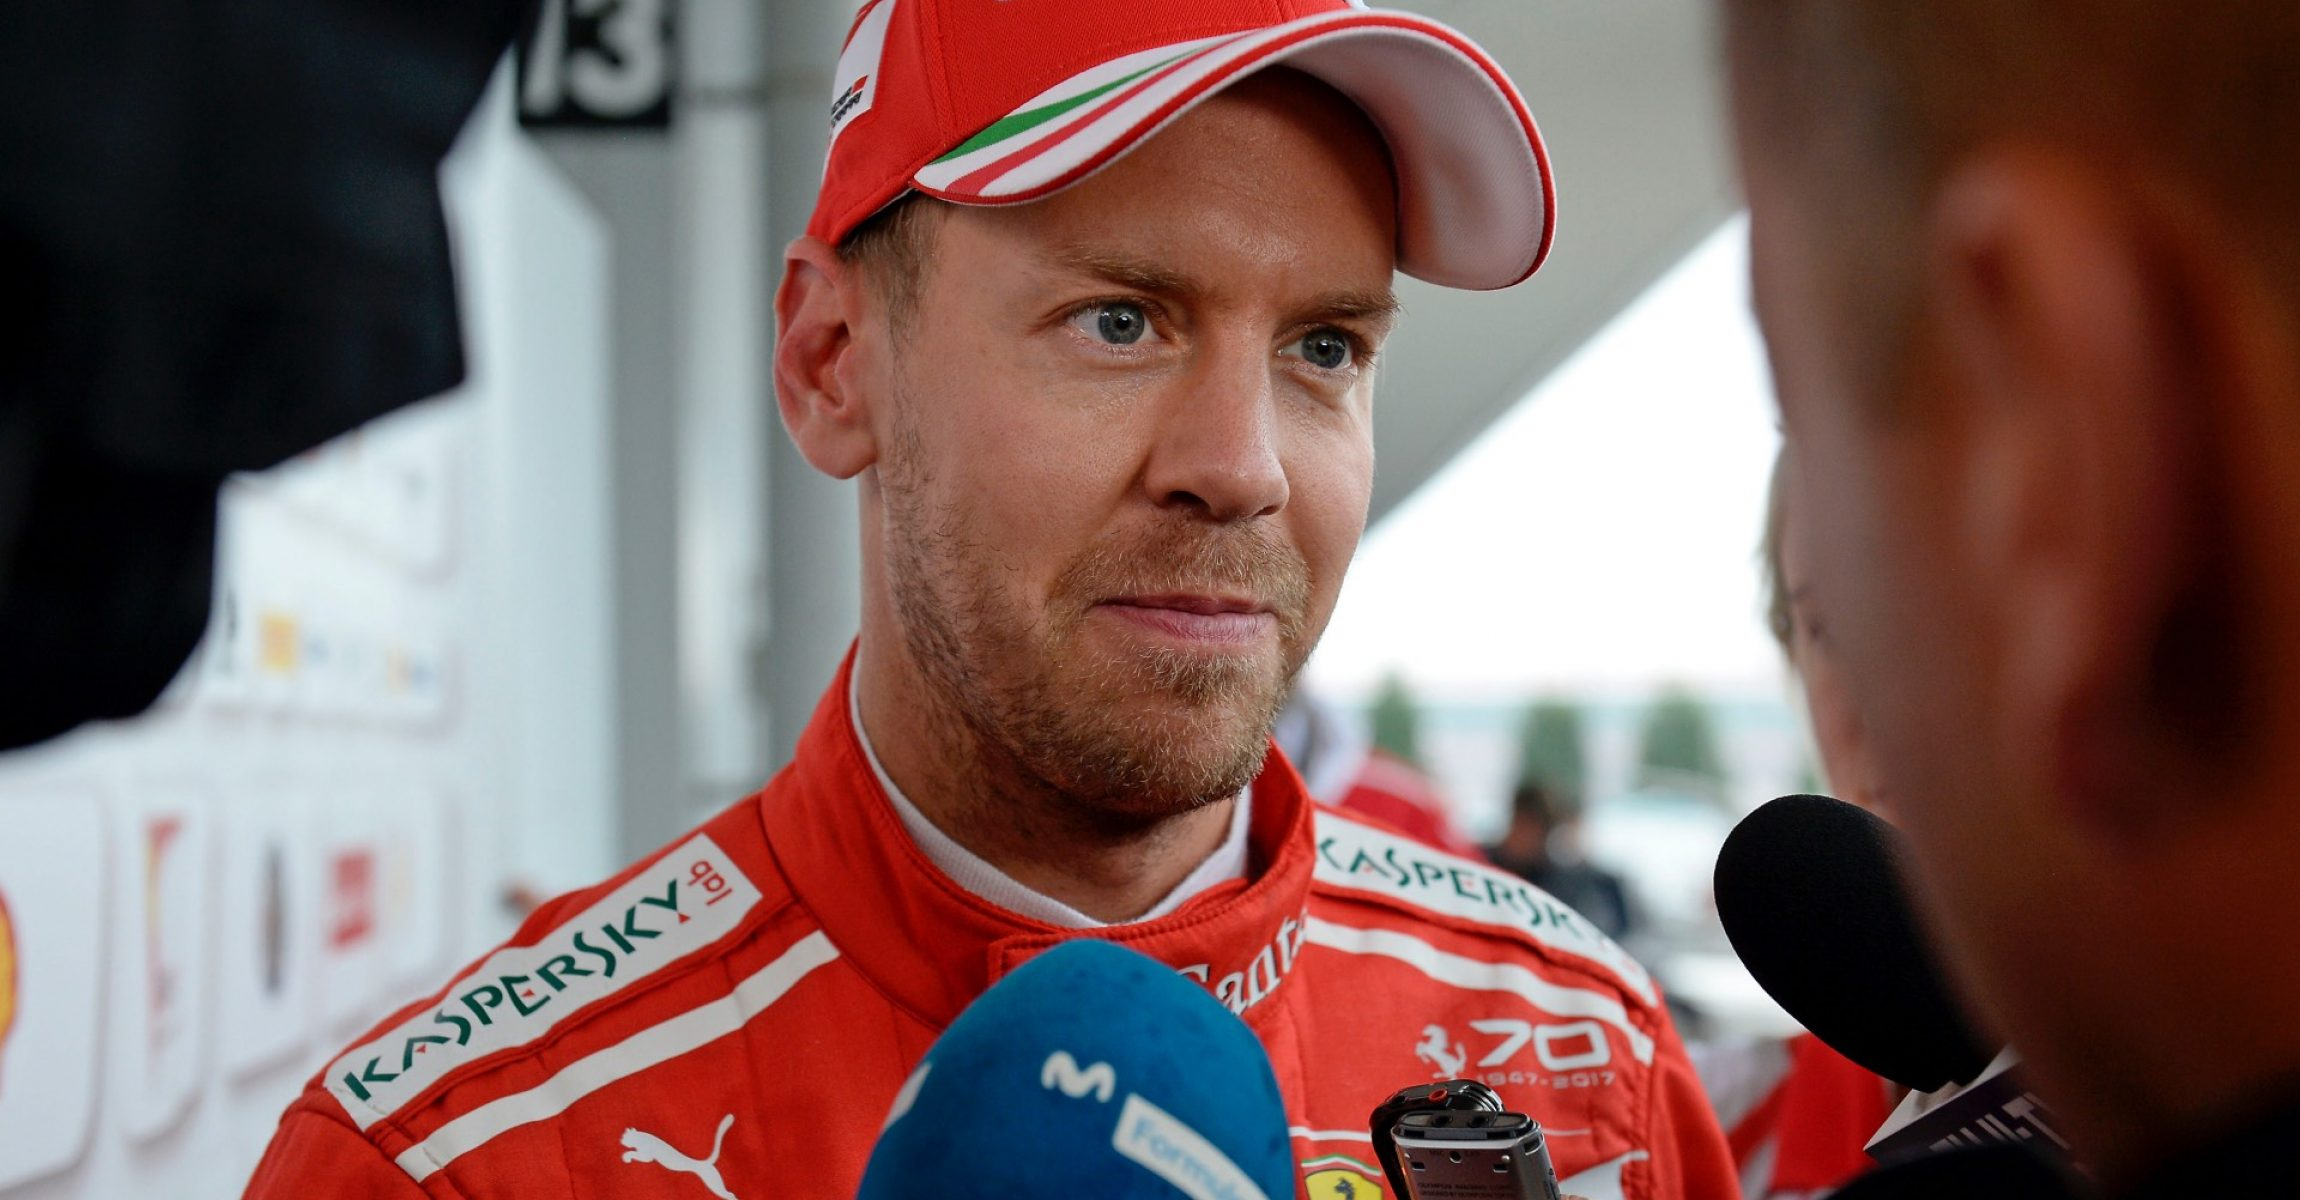 GP GIAPPONE F1/2017 © FOTO STUDIO COLOMBO PER FERRARI MEDIA (© COPYRIGHT FREE), Sebastian Vettel, JapaneseGP2017, Ferrari